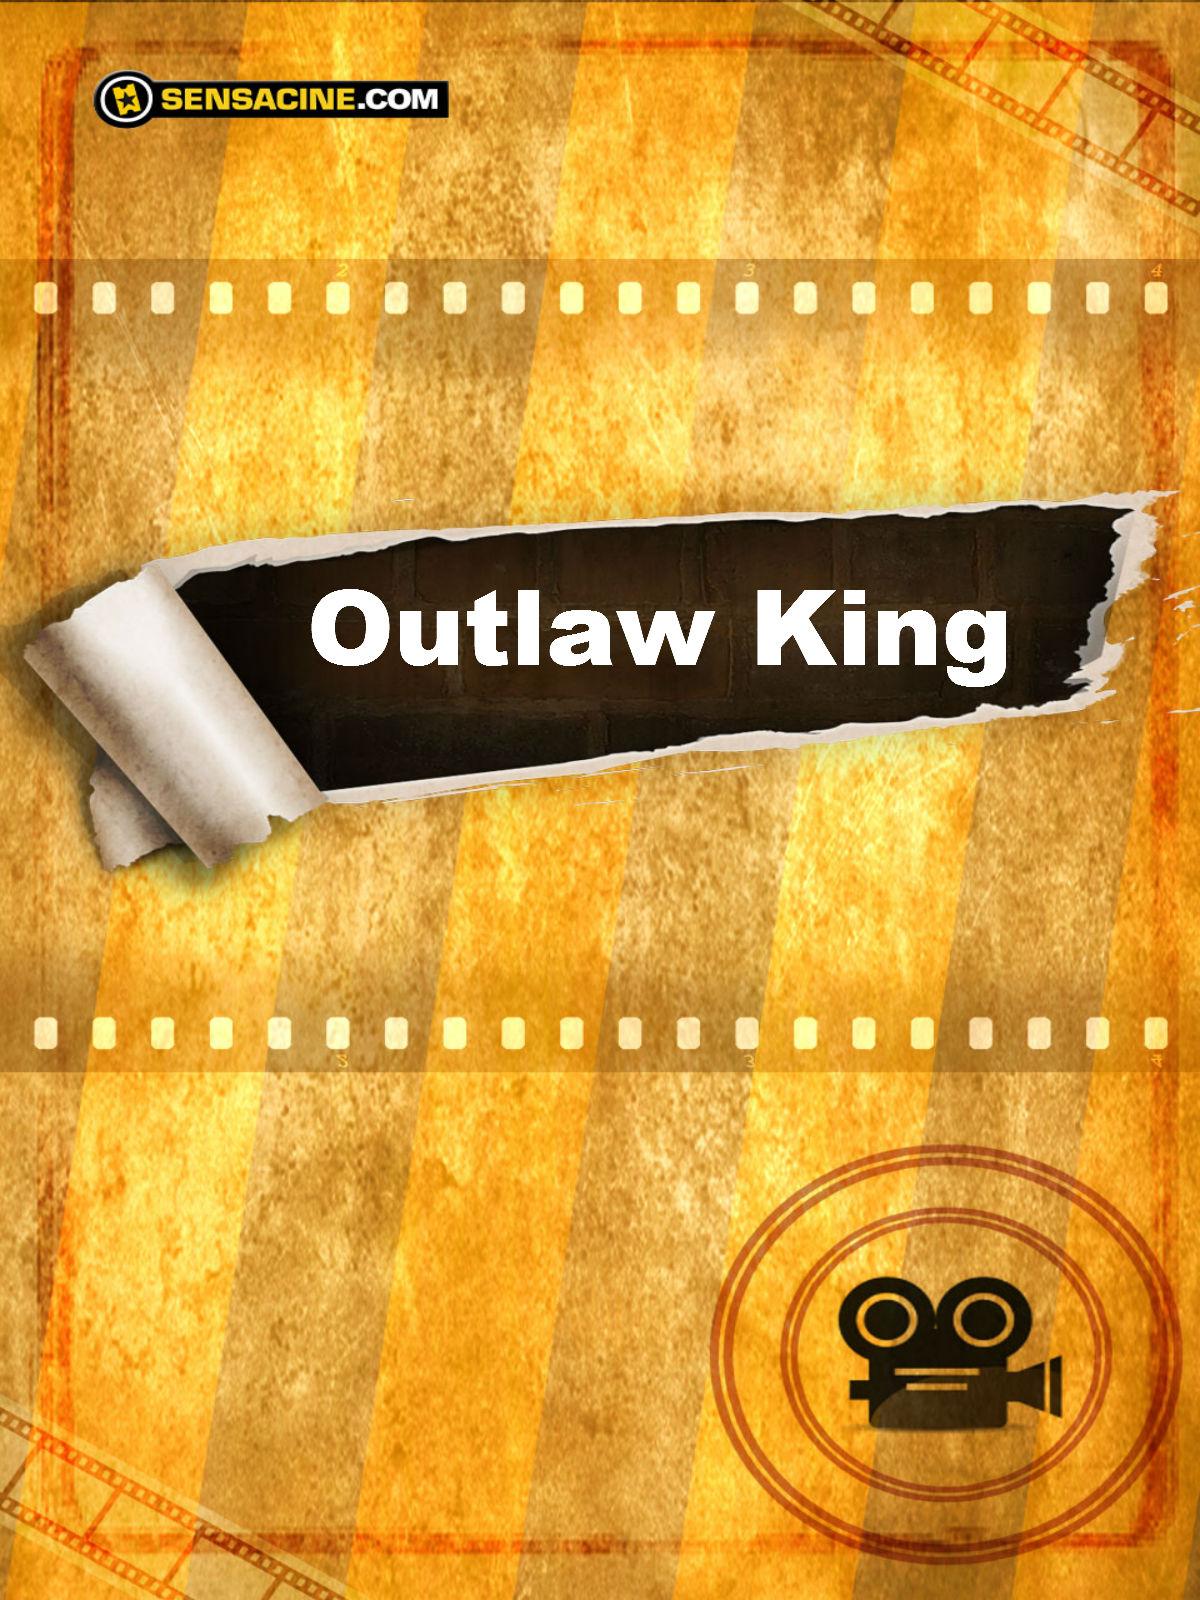 Outlaw King Besetzung